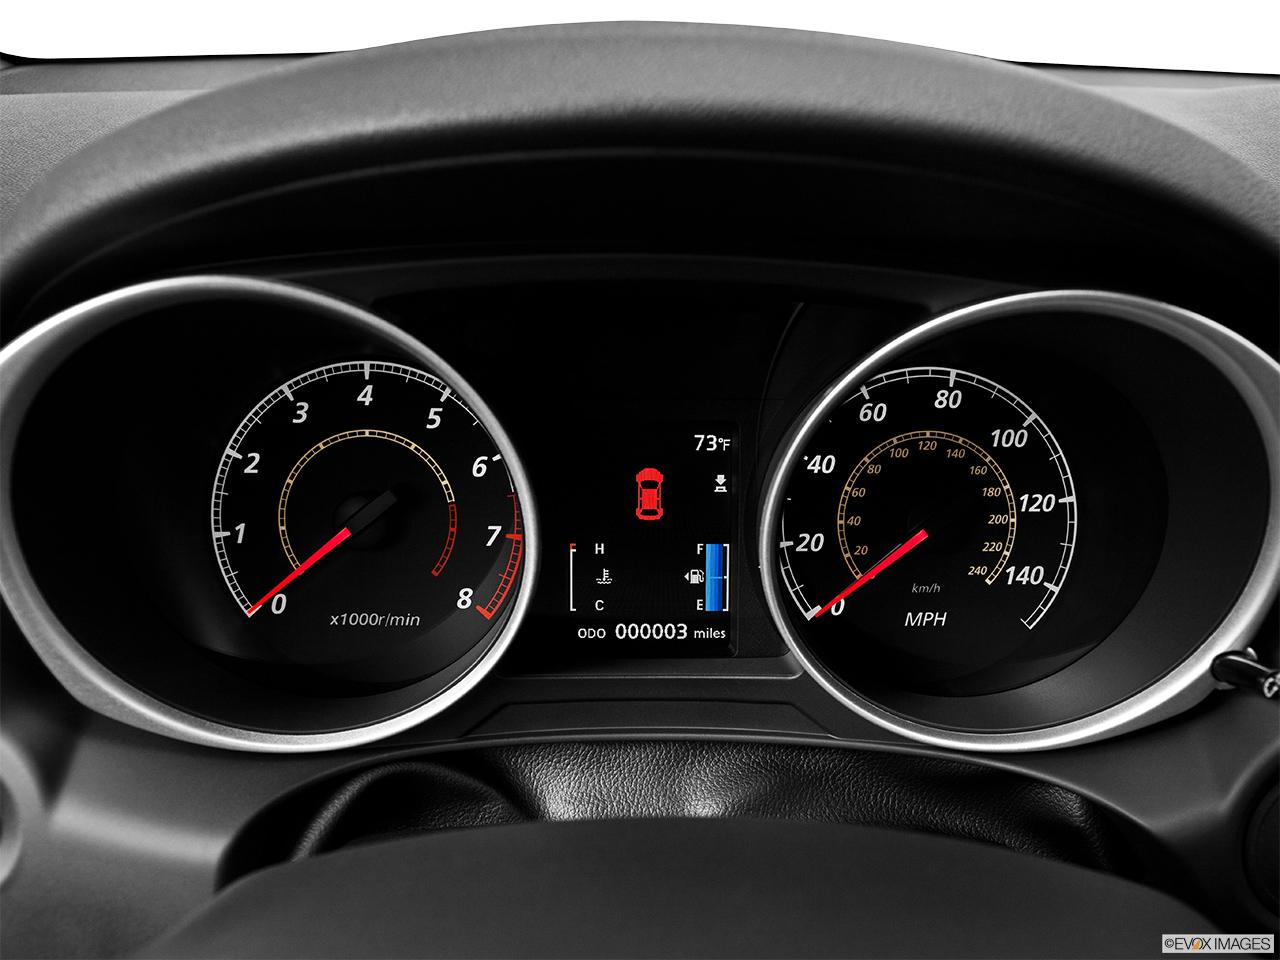 2014 Mitsubishi Outlander Sport AWD CVT ES - Speedometer ...